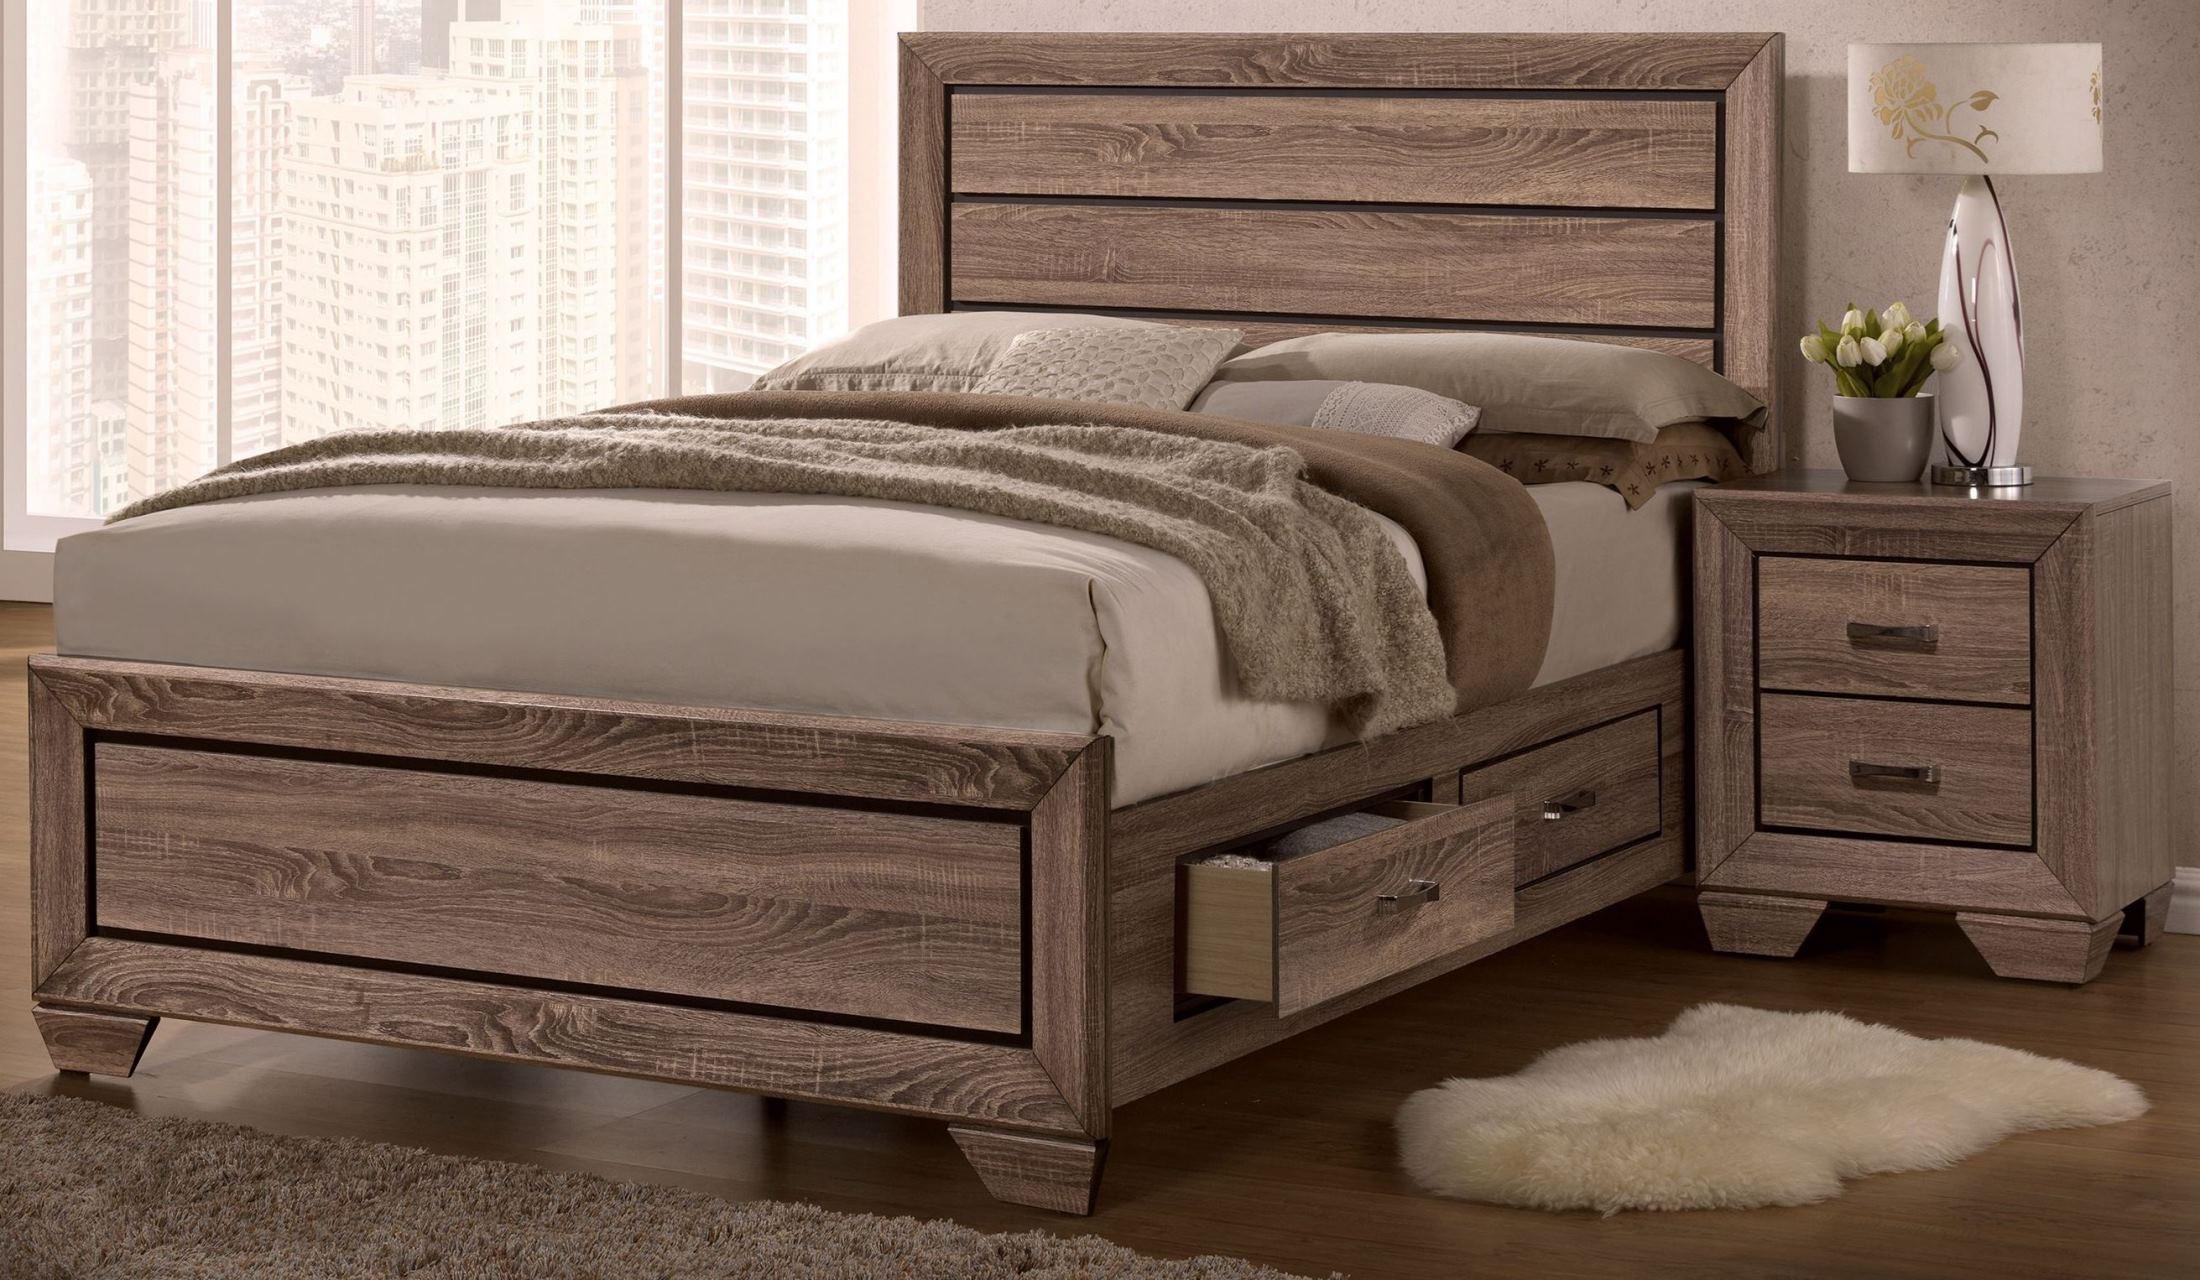 kauffman washed taupe panel storage bedroom set 204190q